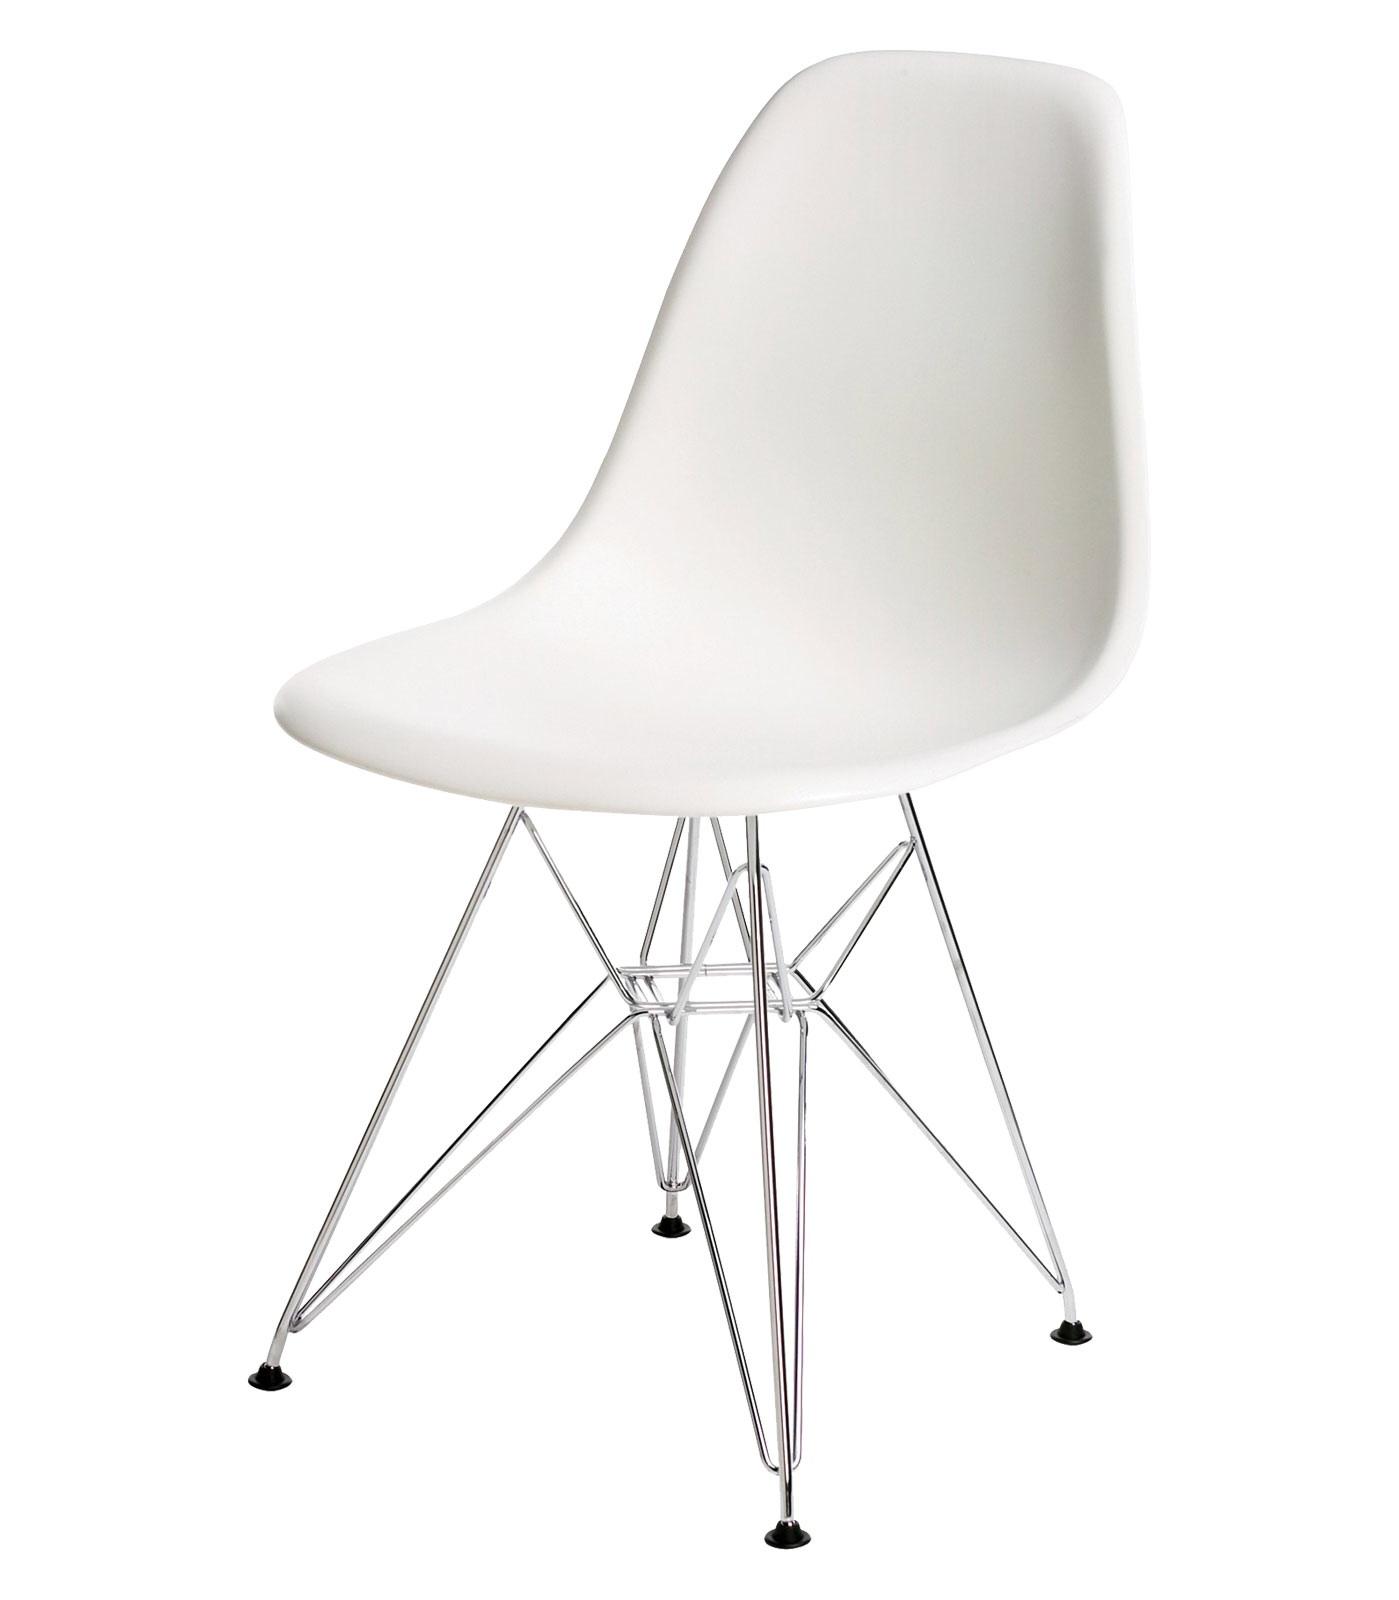 woher bekomme ich designer m bel replicas g nstig design replica vitra. Black Bedroom Furniture Sets. Home Design Ideas